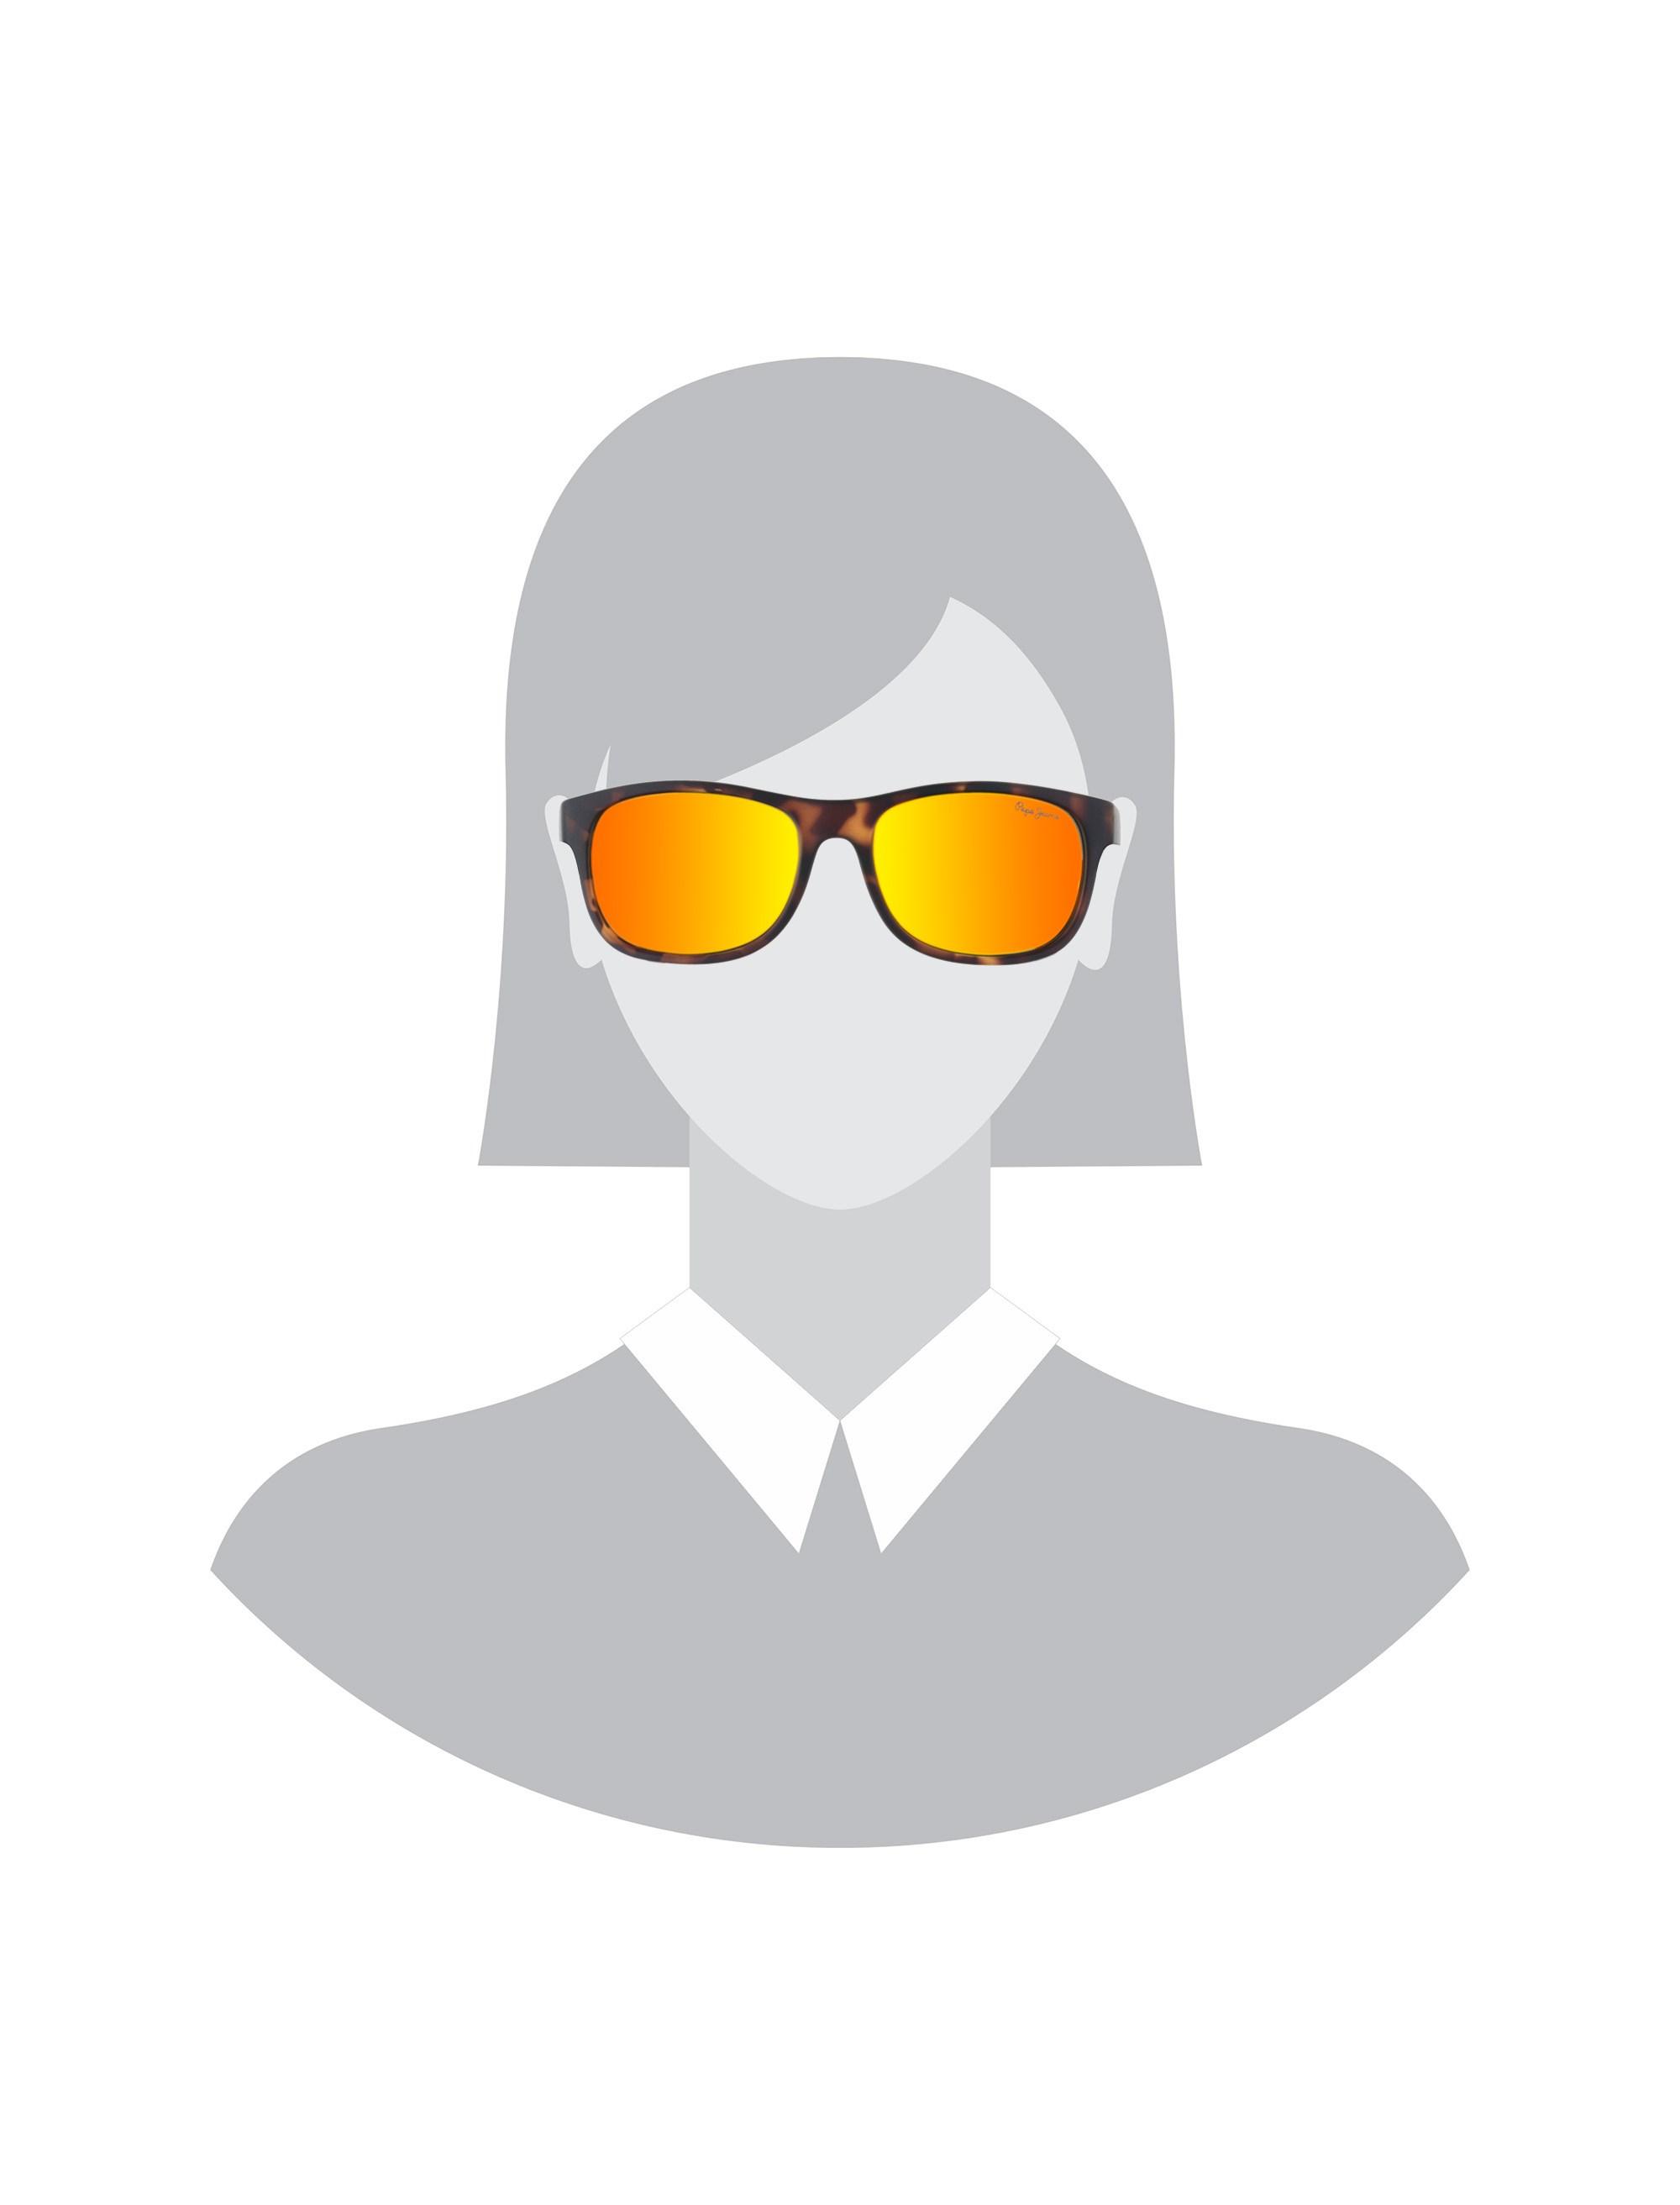 عینک آفتابی ویفرر زنانه - پپه جینز - قهوه اي لاک پشتي - 5